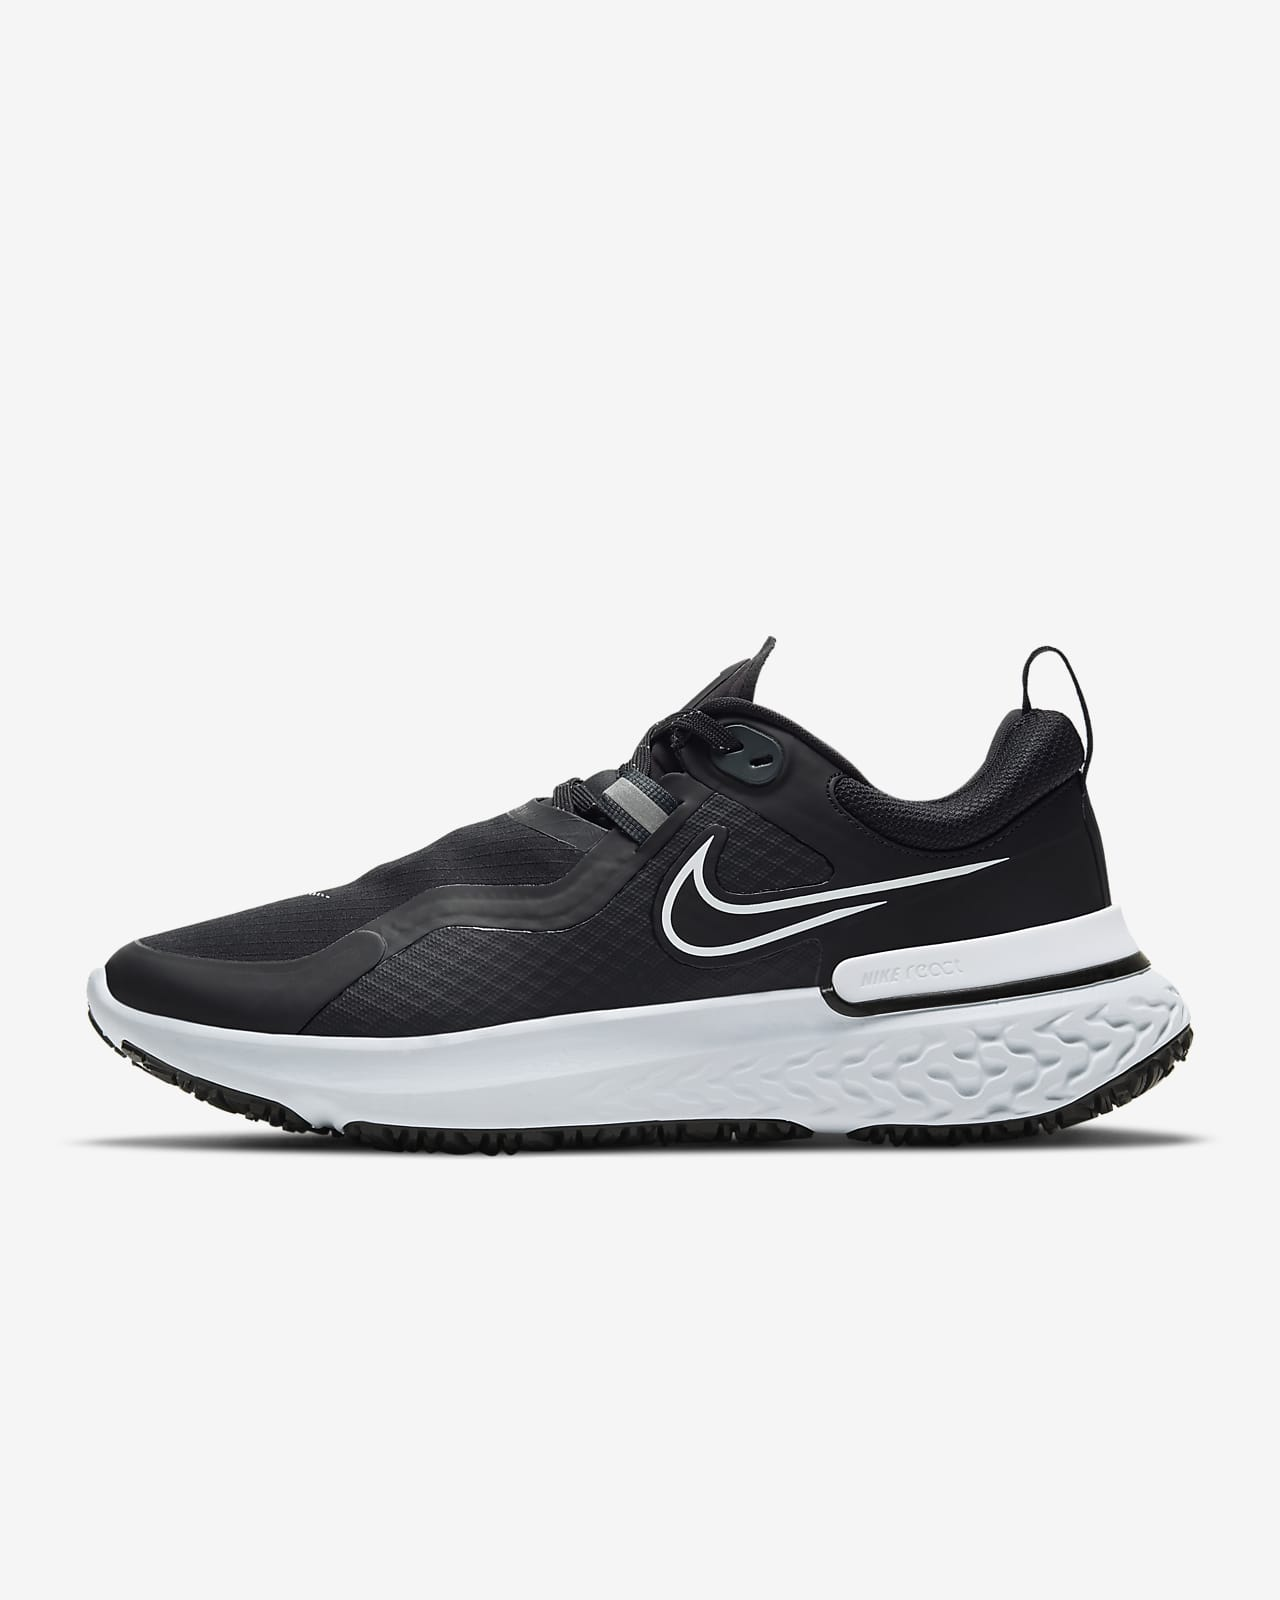 Chaussure de running Nike React Miler Shield pour Femme